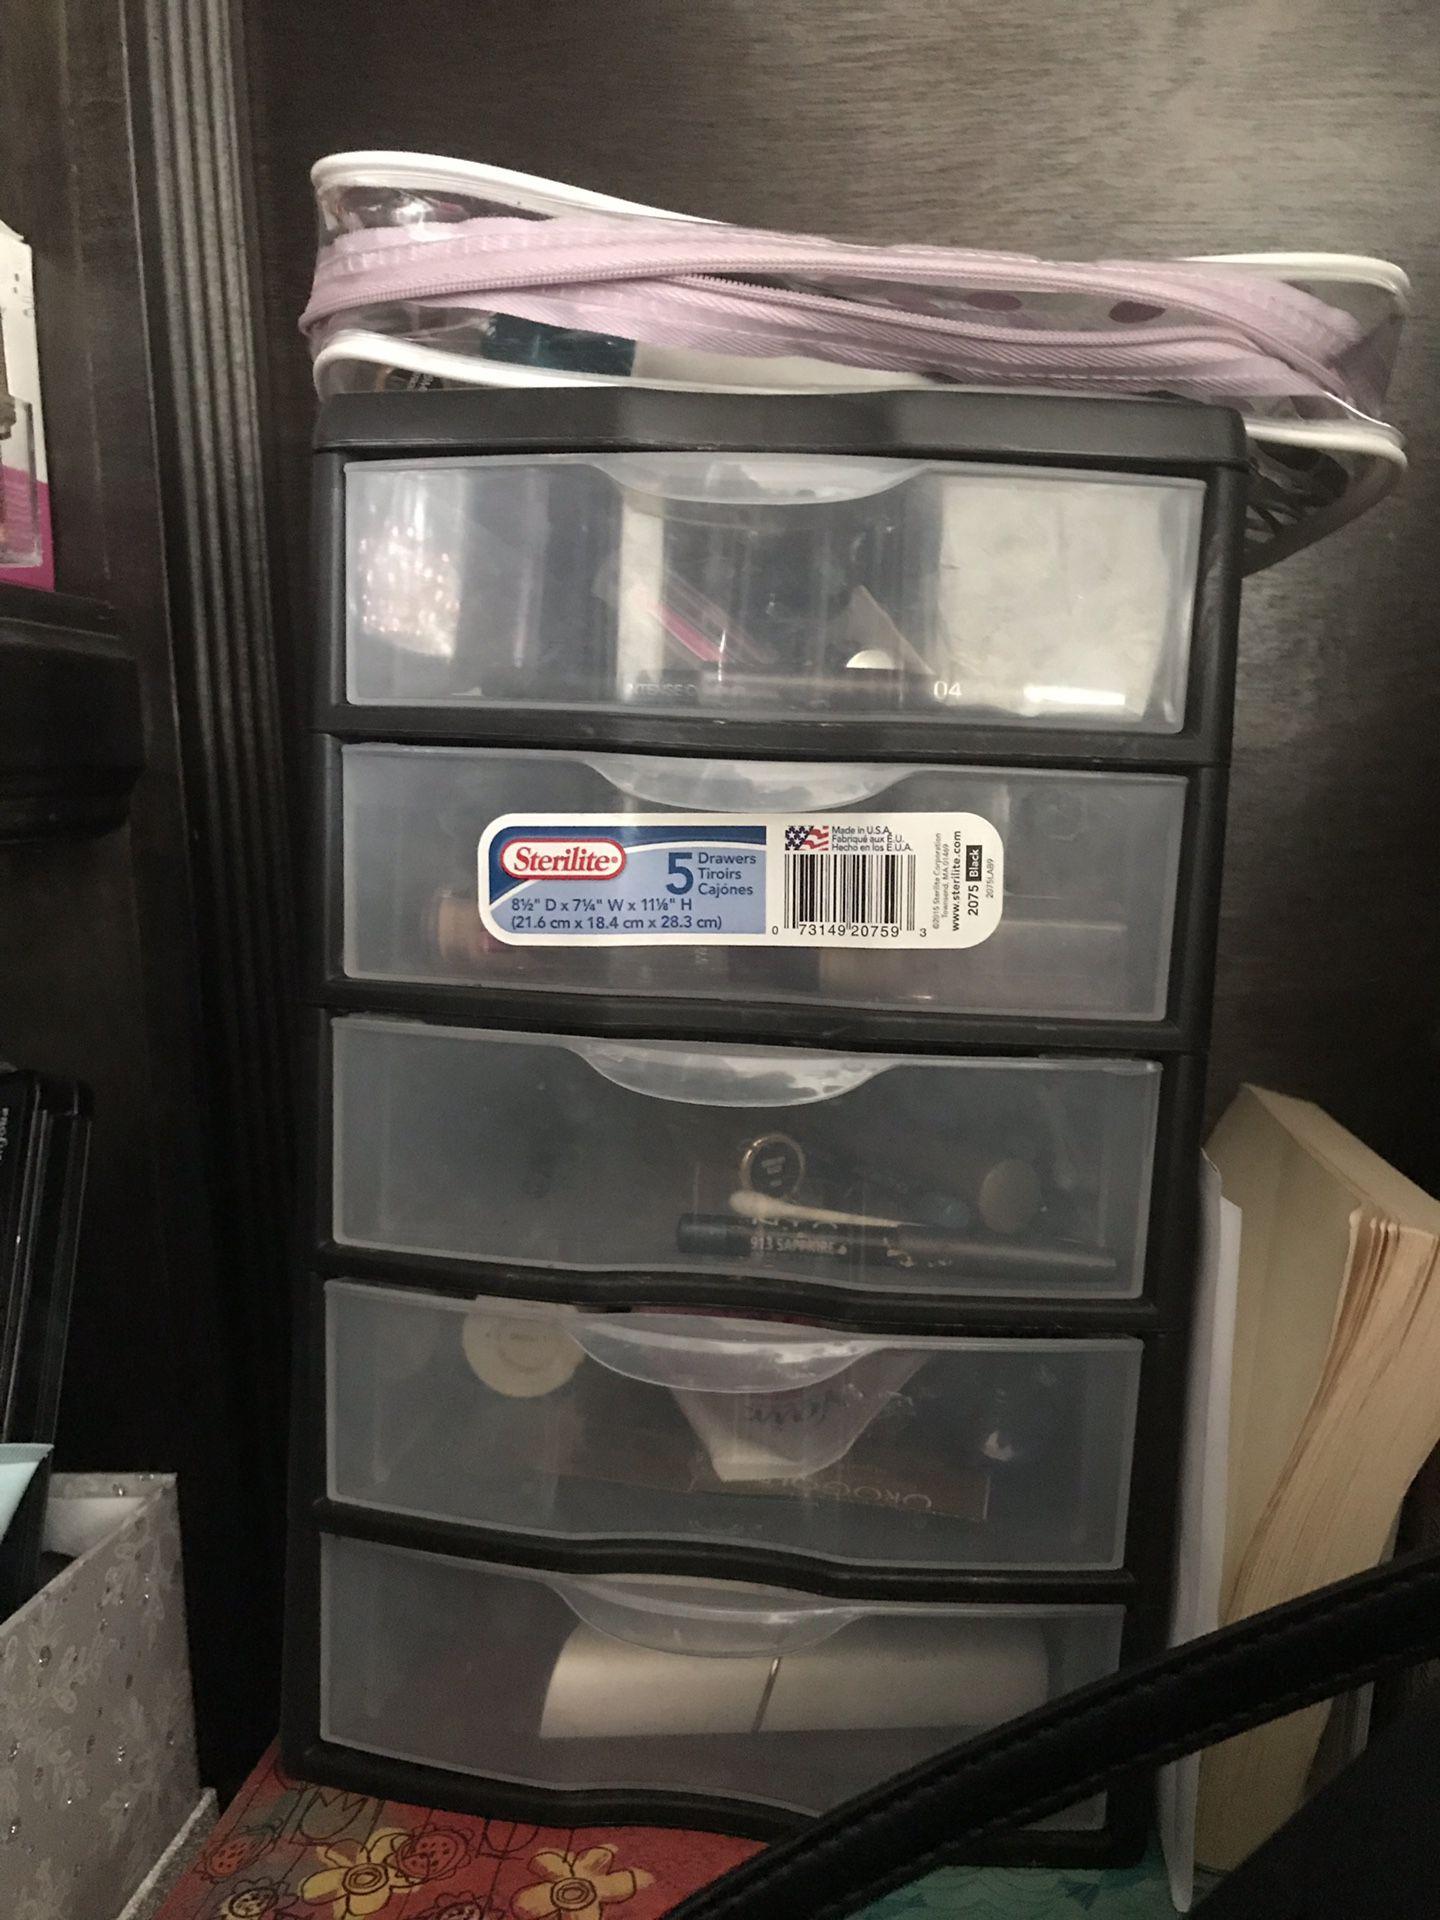 Organizer/makeup organizer